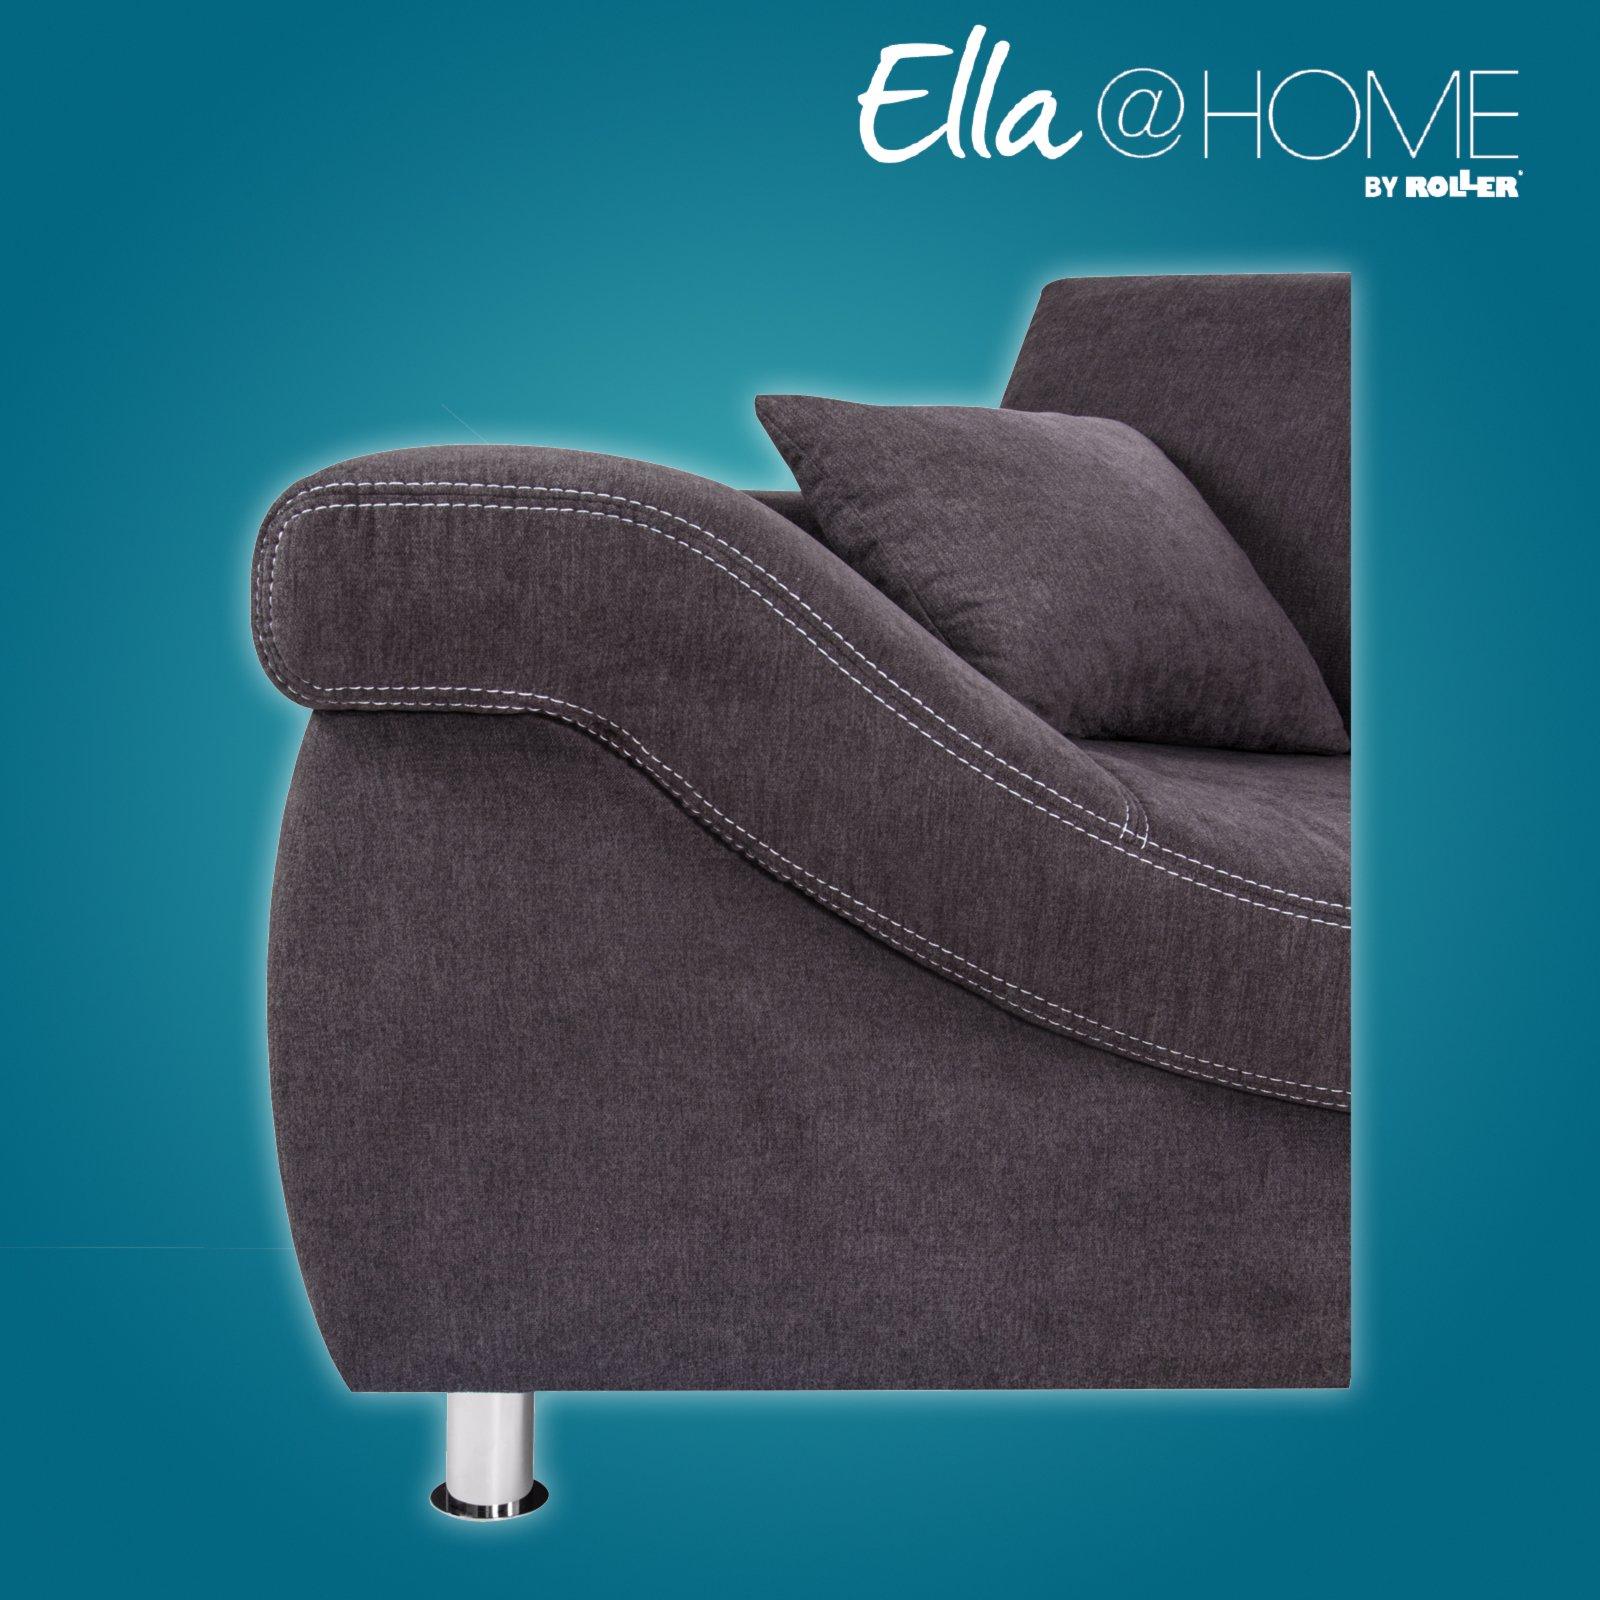 roller ecksofa cheap sofas with roller ecksofa roller. Black Bedroom Furniture Sets. Home Design Ideas